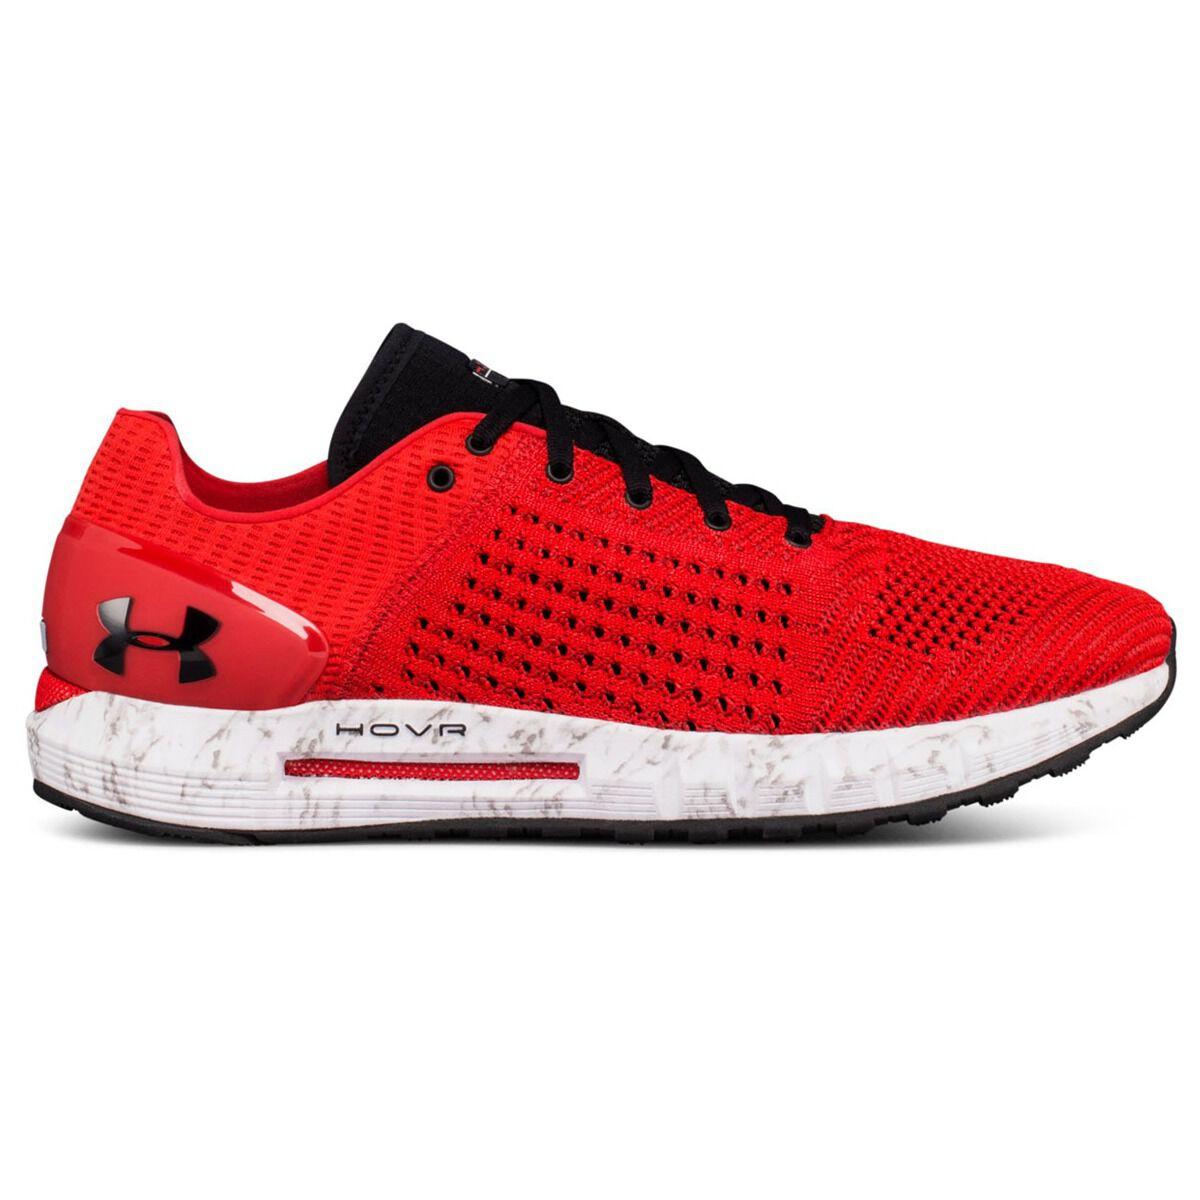 Under Armour Mens Running Sport Sonic Red 7Rebel Hovr Shoes Us jGLMqVpSzU